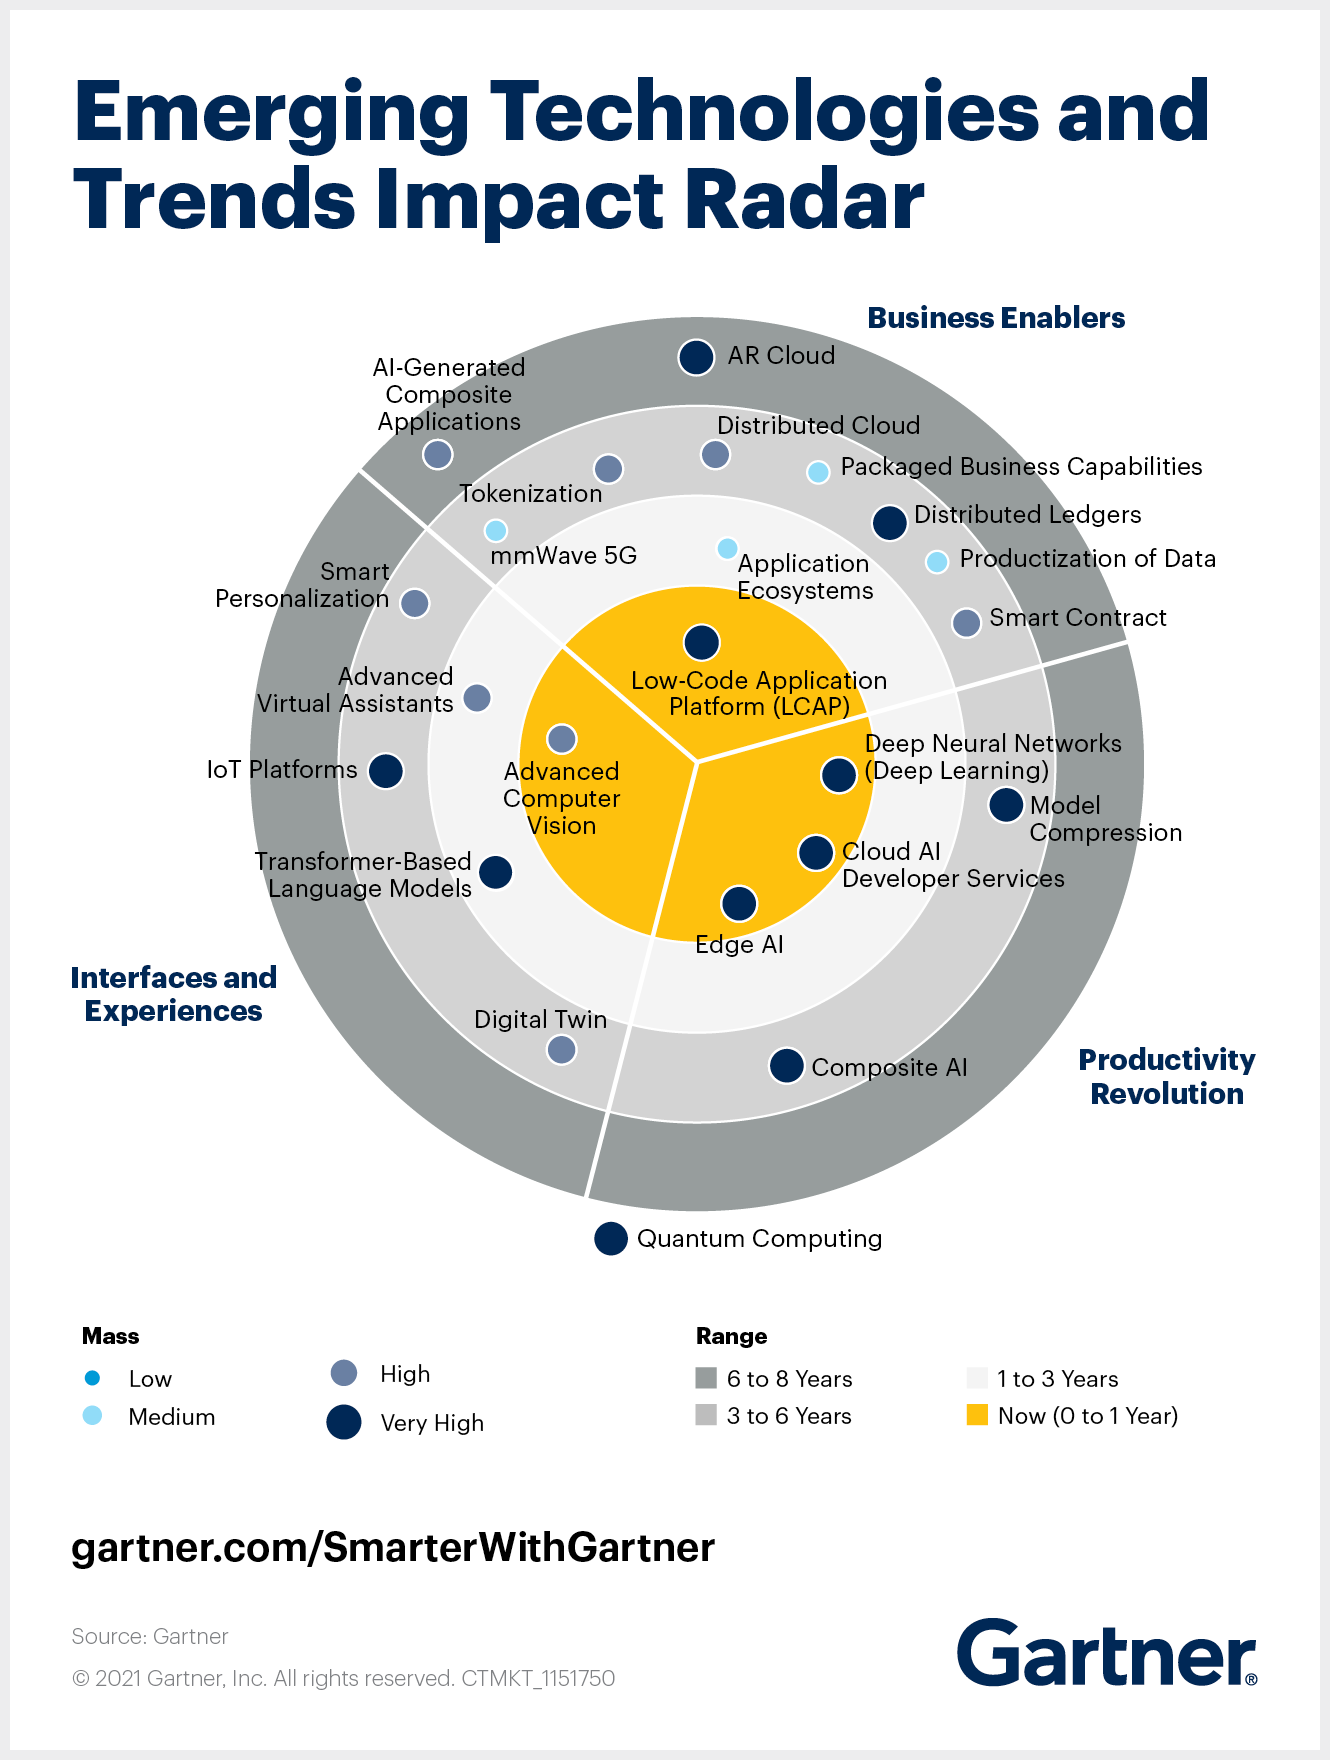 Gartner Emerging technologies and trends impact radar 2021 highlights emerging technologies for product leaders.